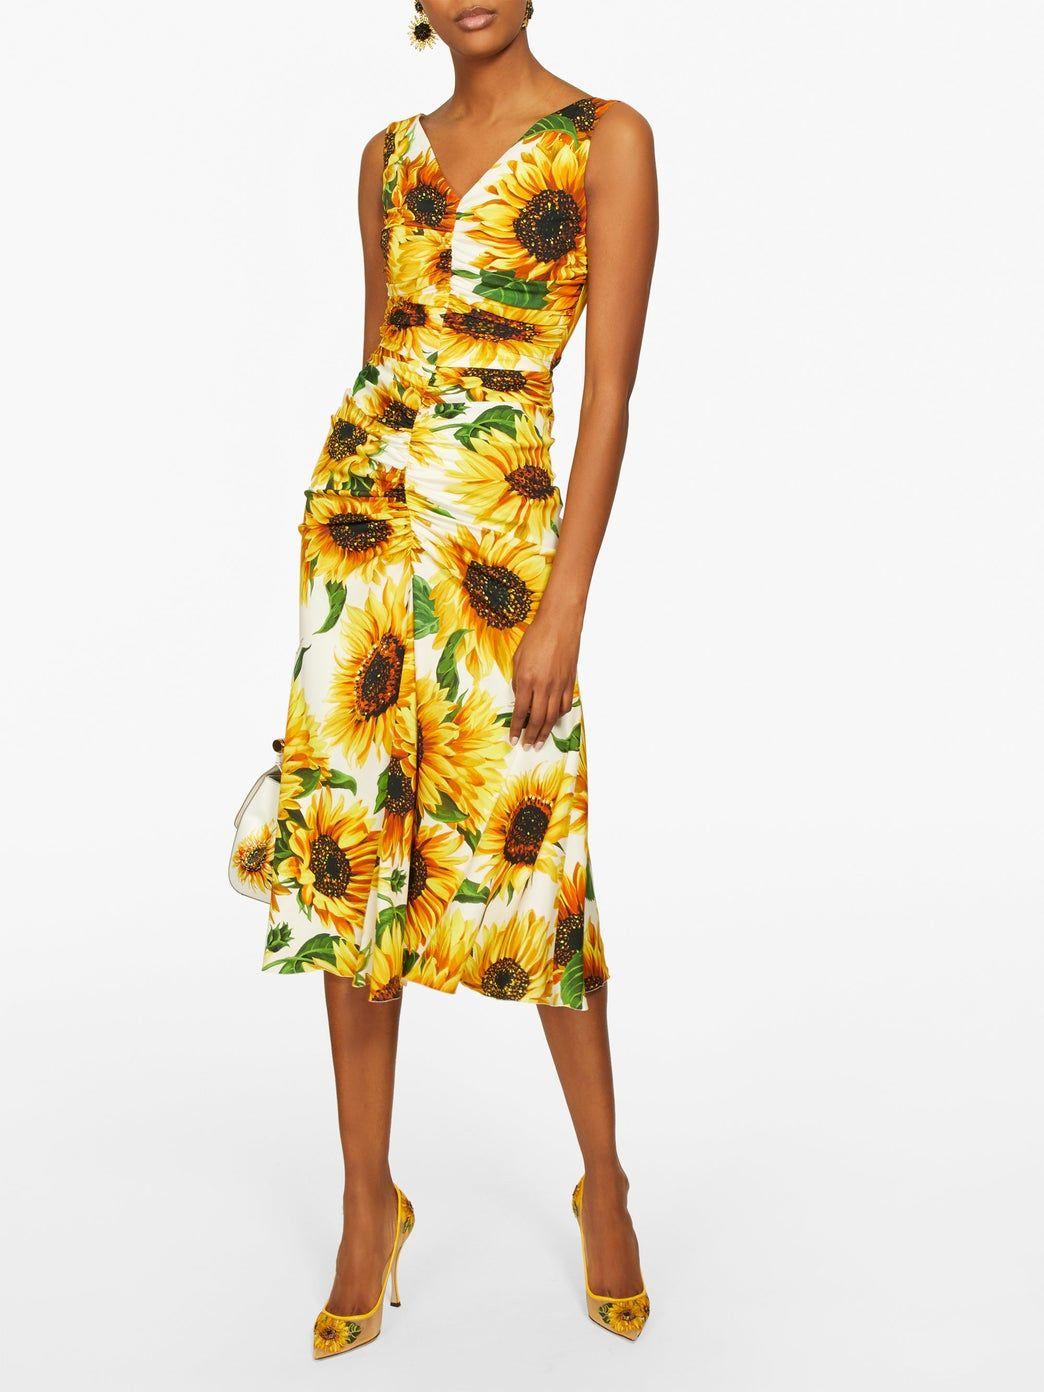 Sunflower Print Gathered Midi Dress Dolce Gabbana Matchesfashion Us Faldas Dolce Gabbana Girasoles [ 1392 x 1044 Pixel ]